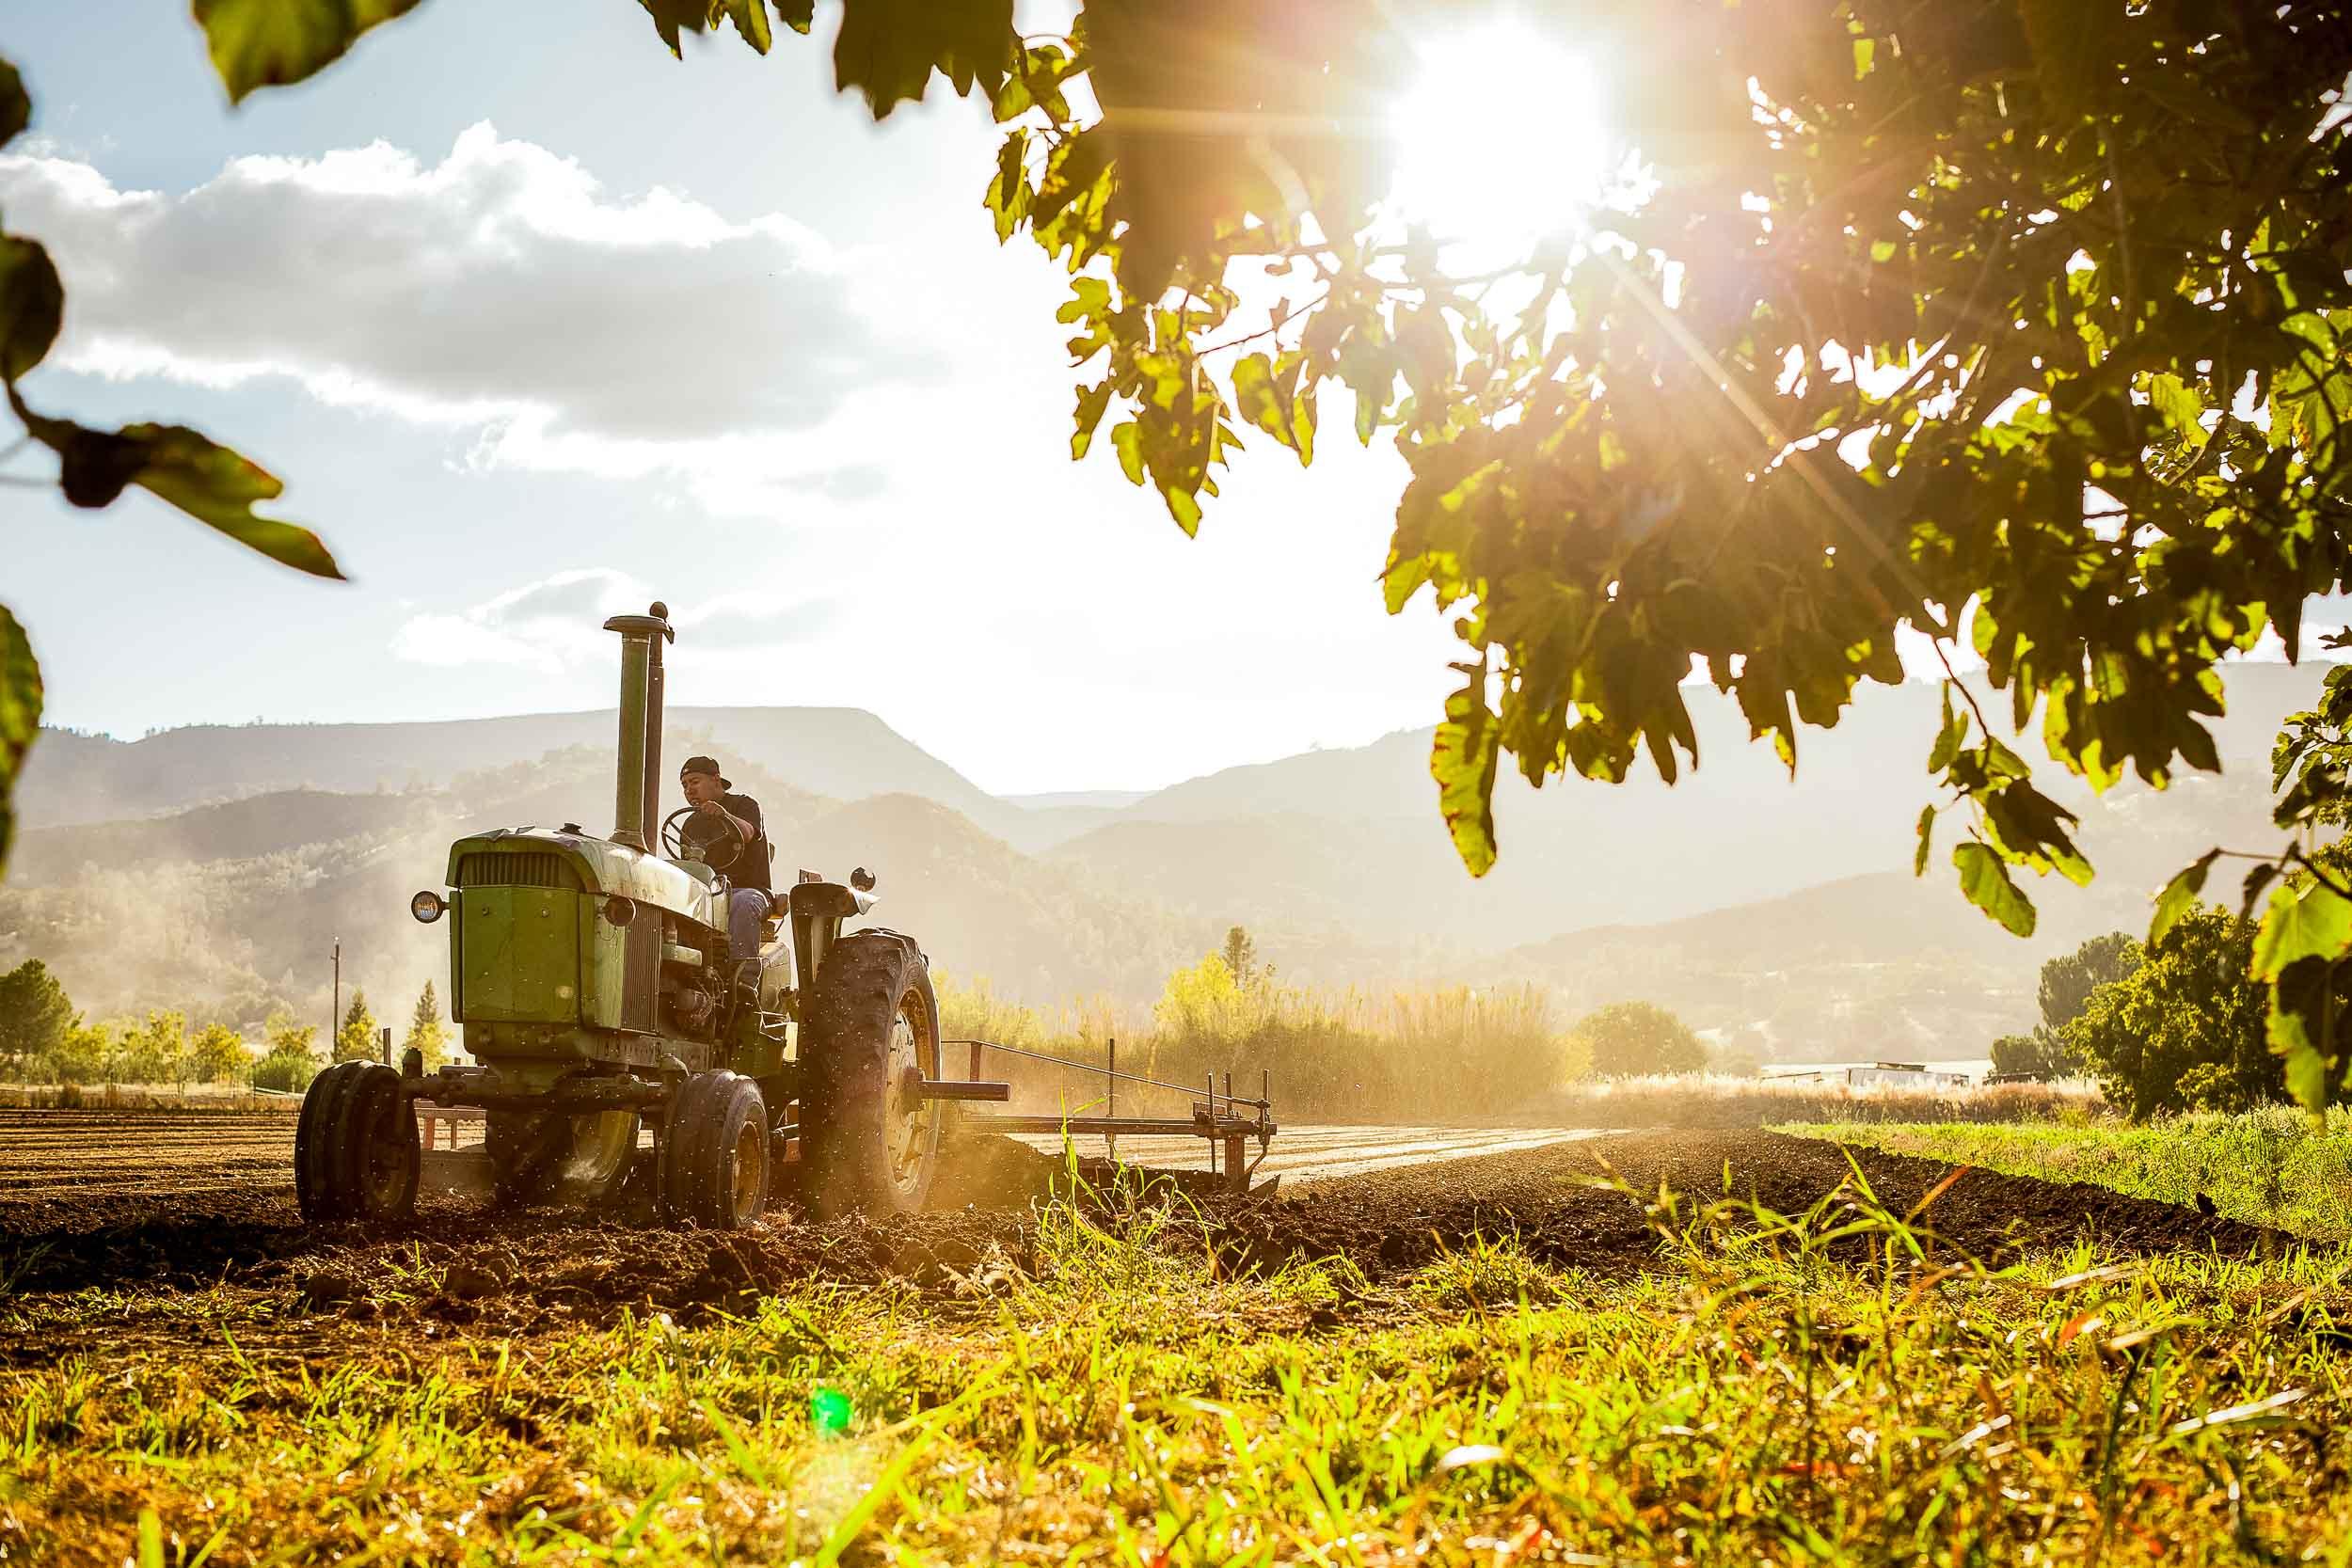 NatandCody-Agriculture-01.jpg